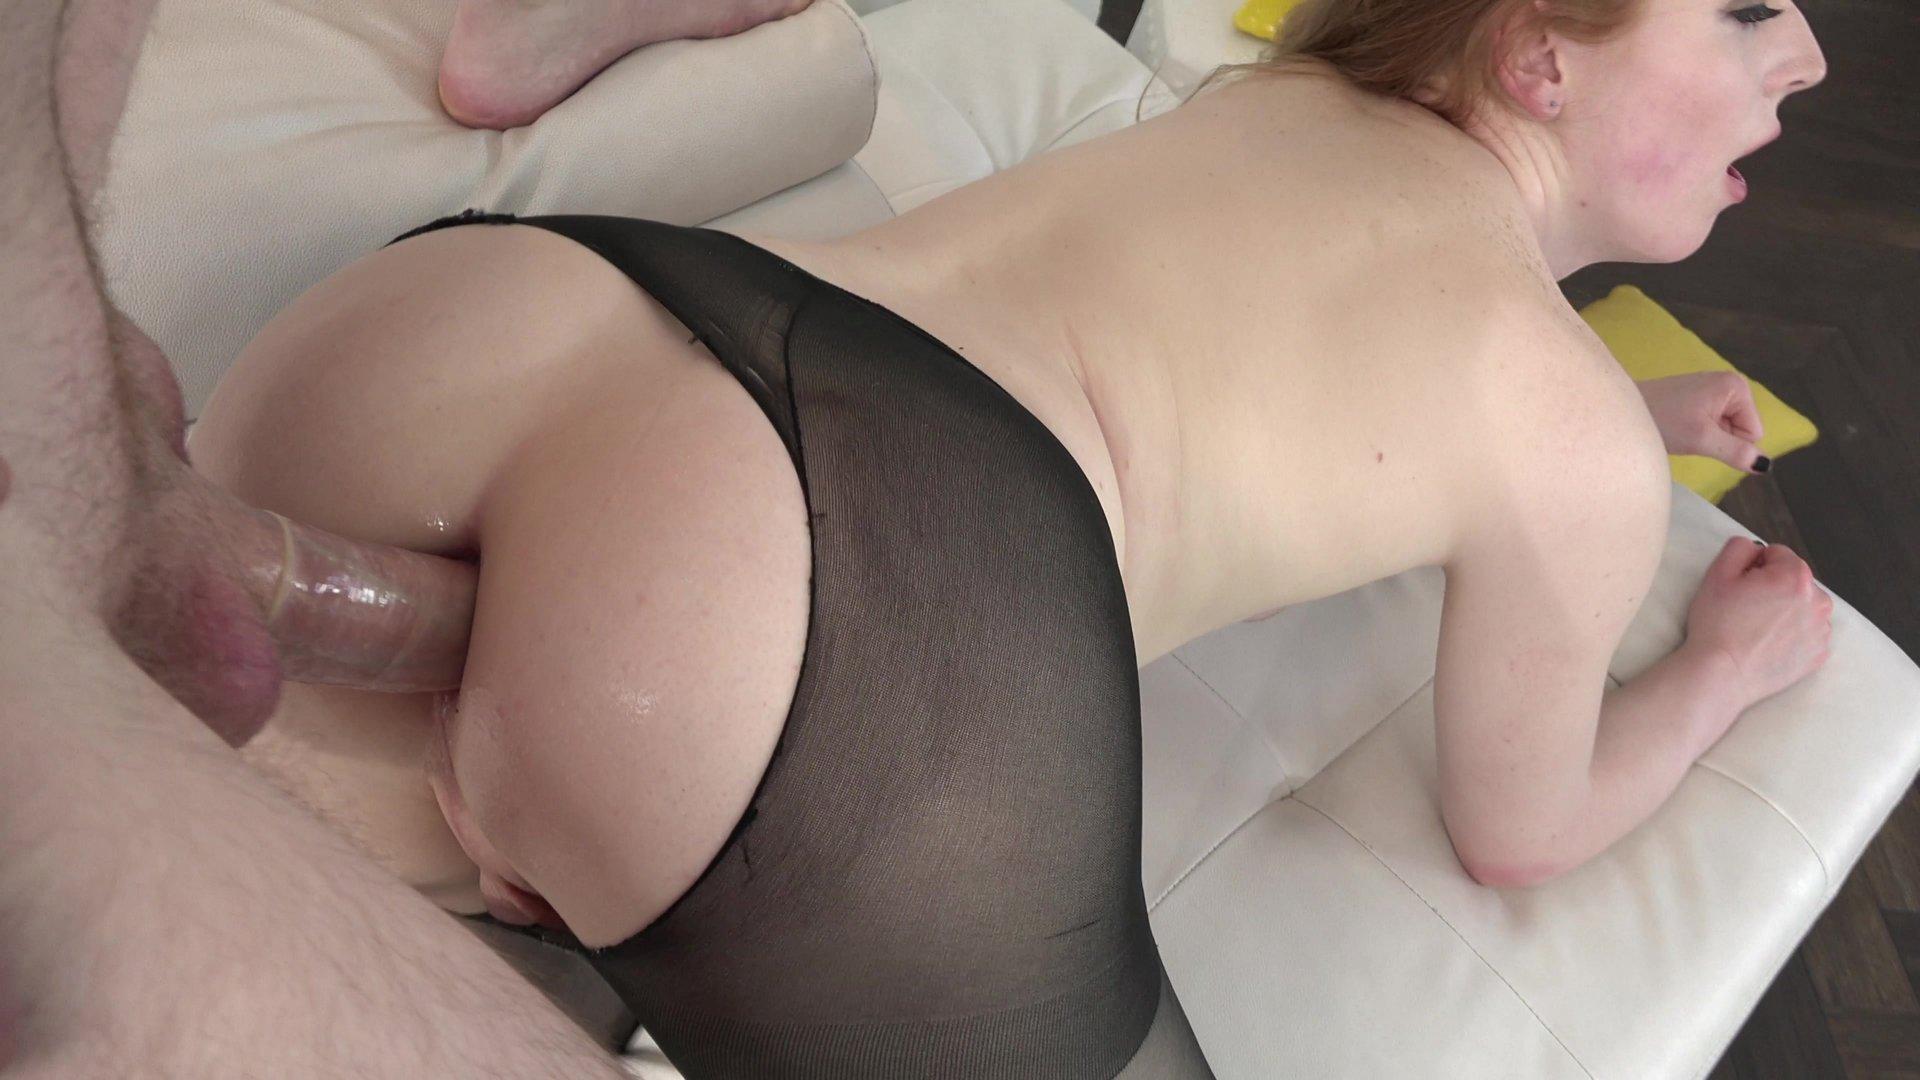 Bubble butts pantyhose sex, bbw making out porn